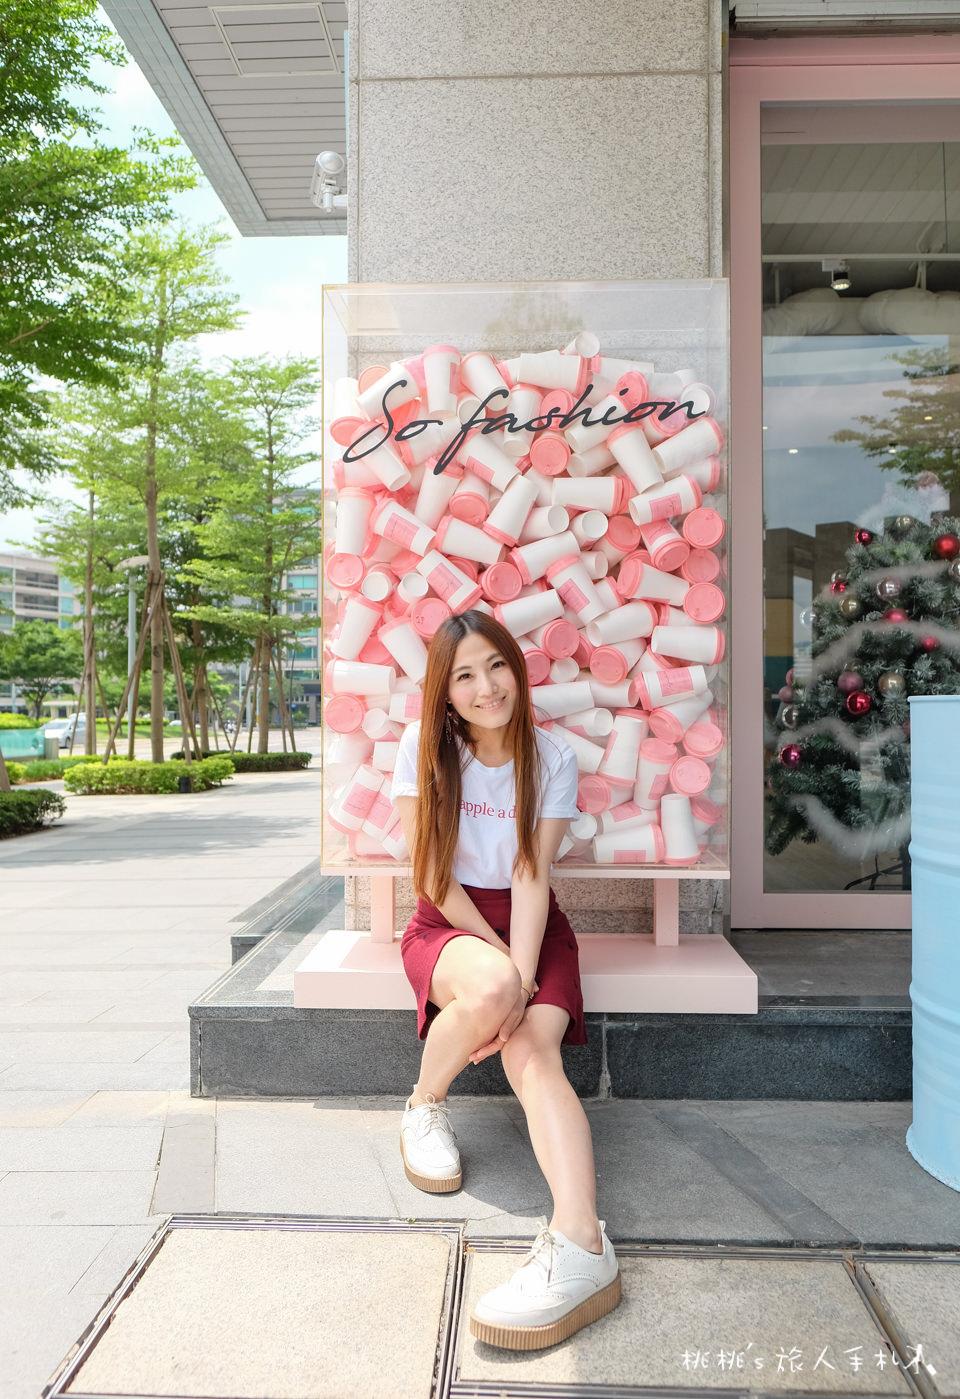 IG打卡餐廳》台北內湖 So fashion cafe│粉紅少女系網美咖啡廳!